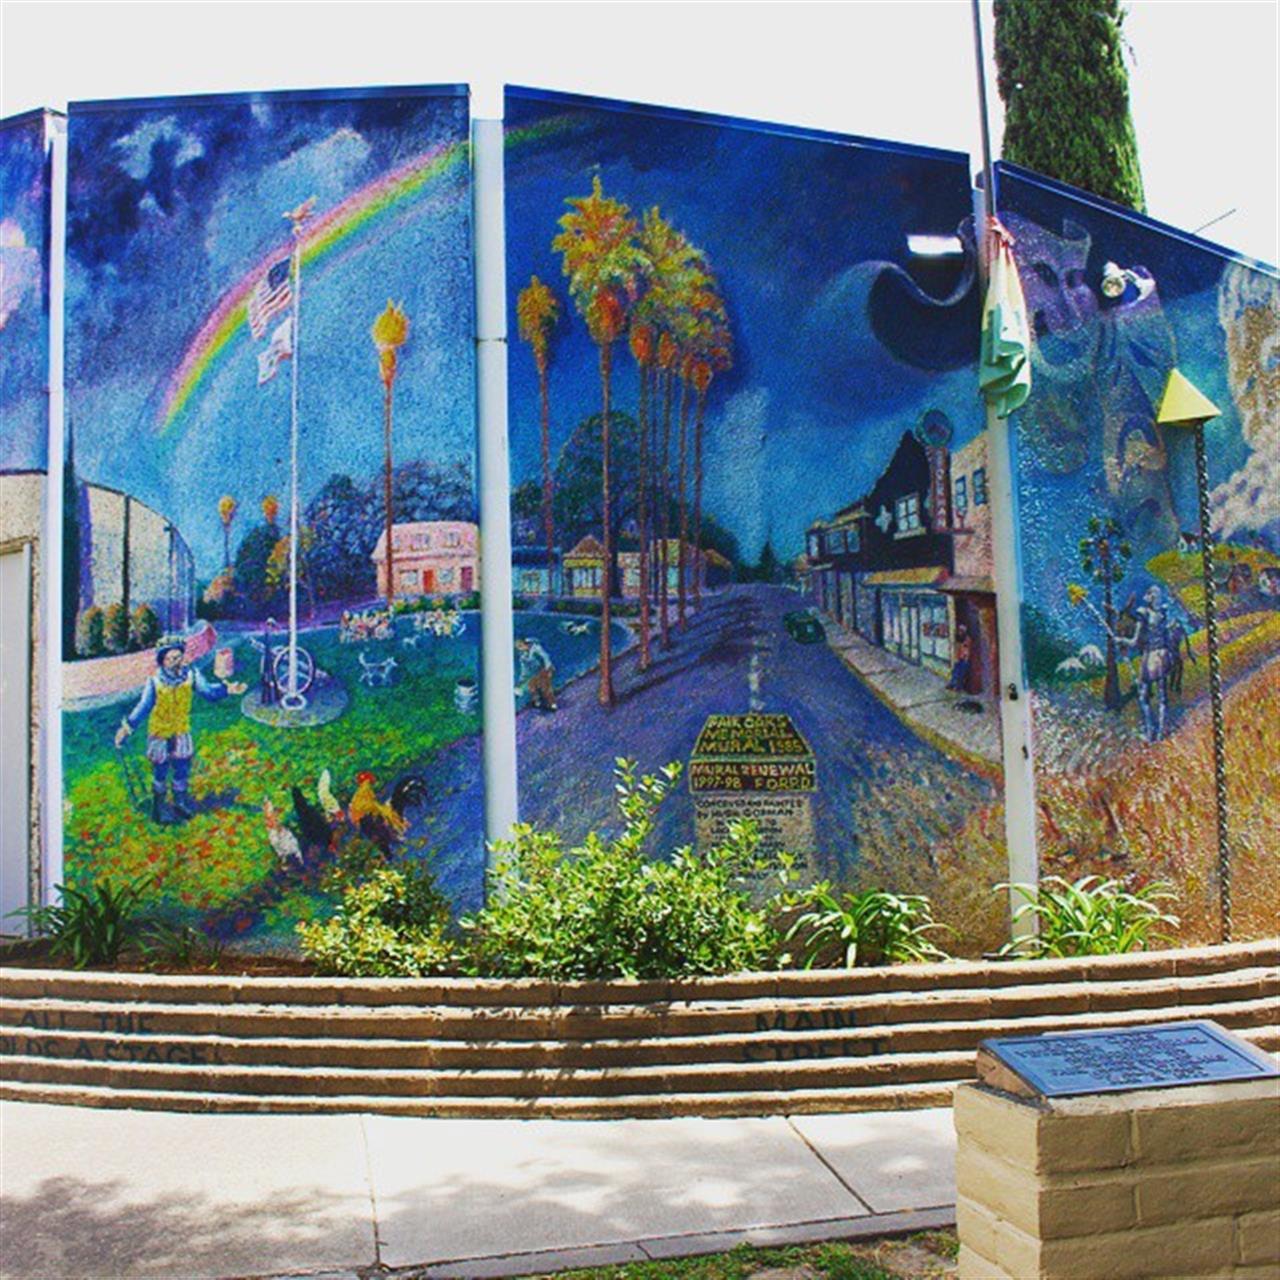 Fair Oaks Memorial Mural located in Old Fair Oaks and part of the Fair Oaks Amphitheater, Plaza Park. Painted by local artist High Gorman. #leadingrelocal #lyonrealestate #fairoaks #fairoaksamphitheatre #localartist